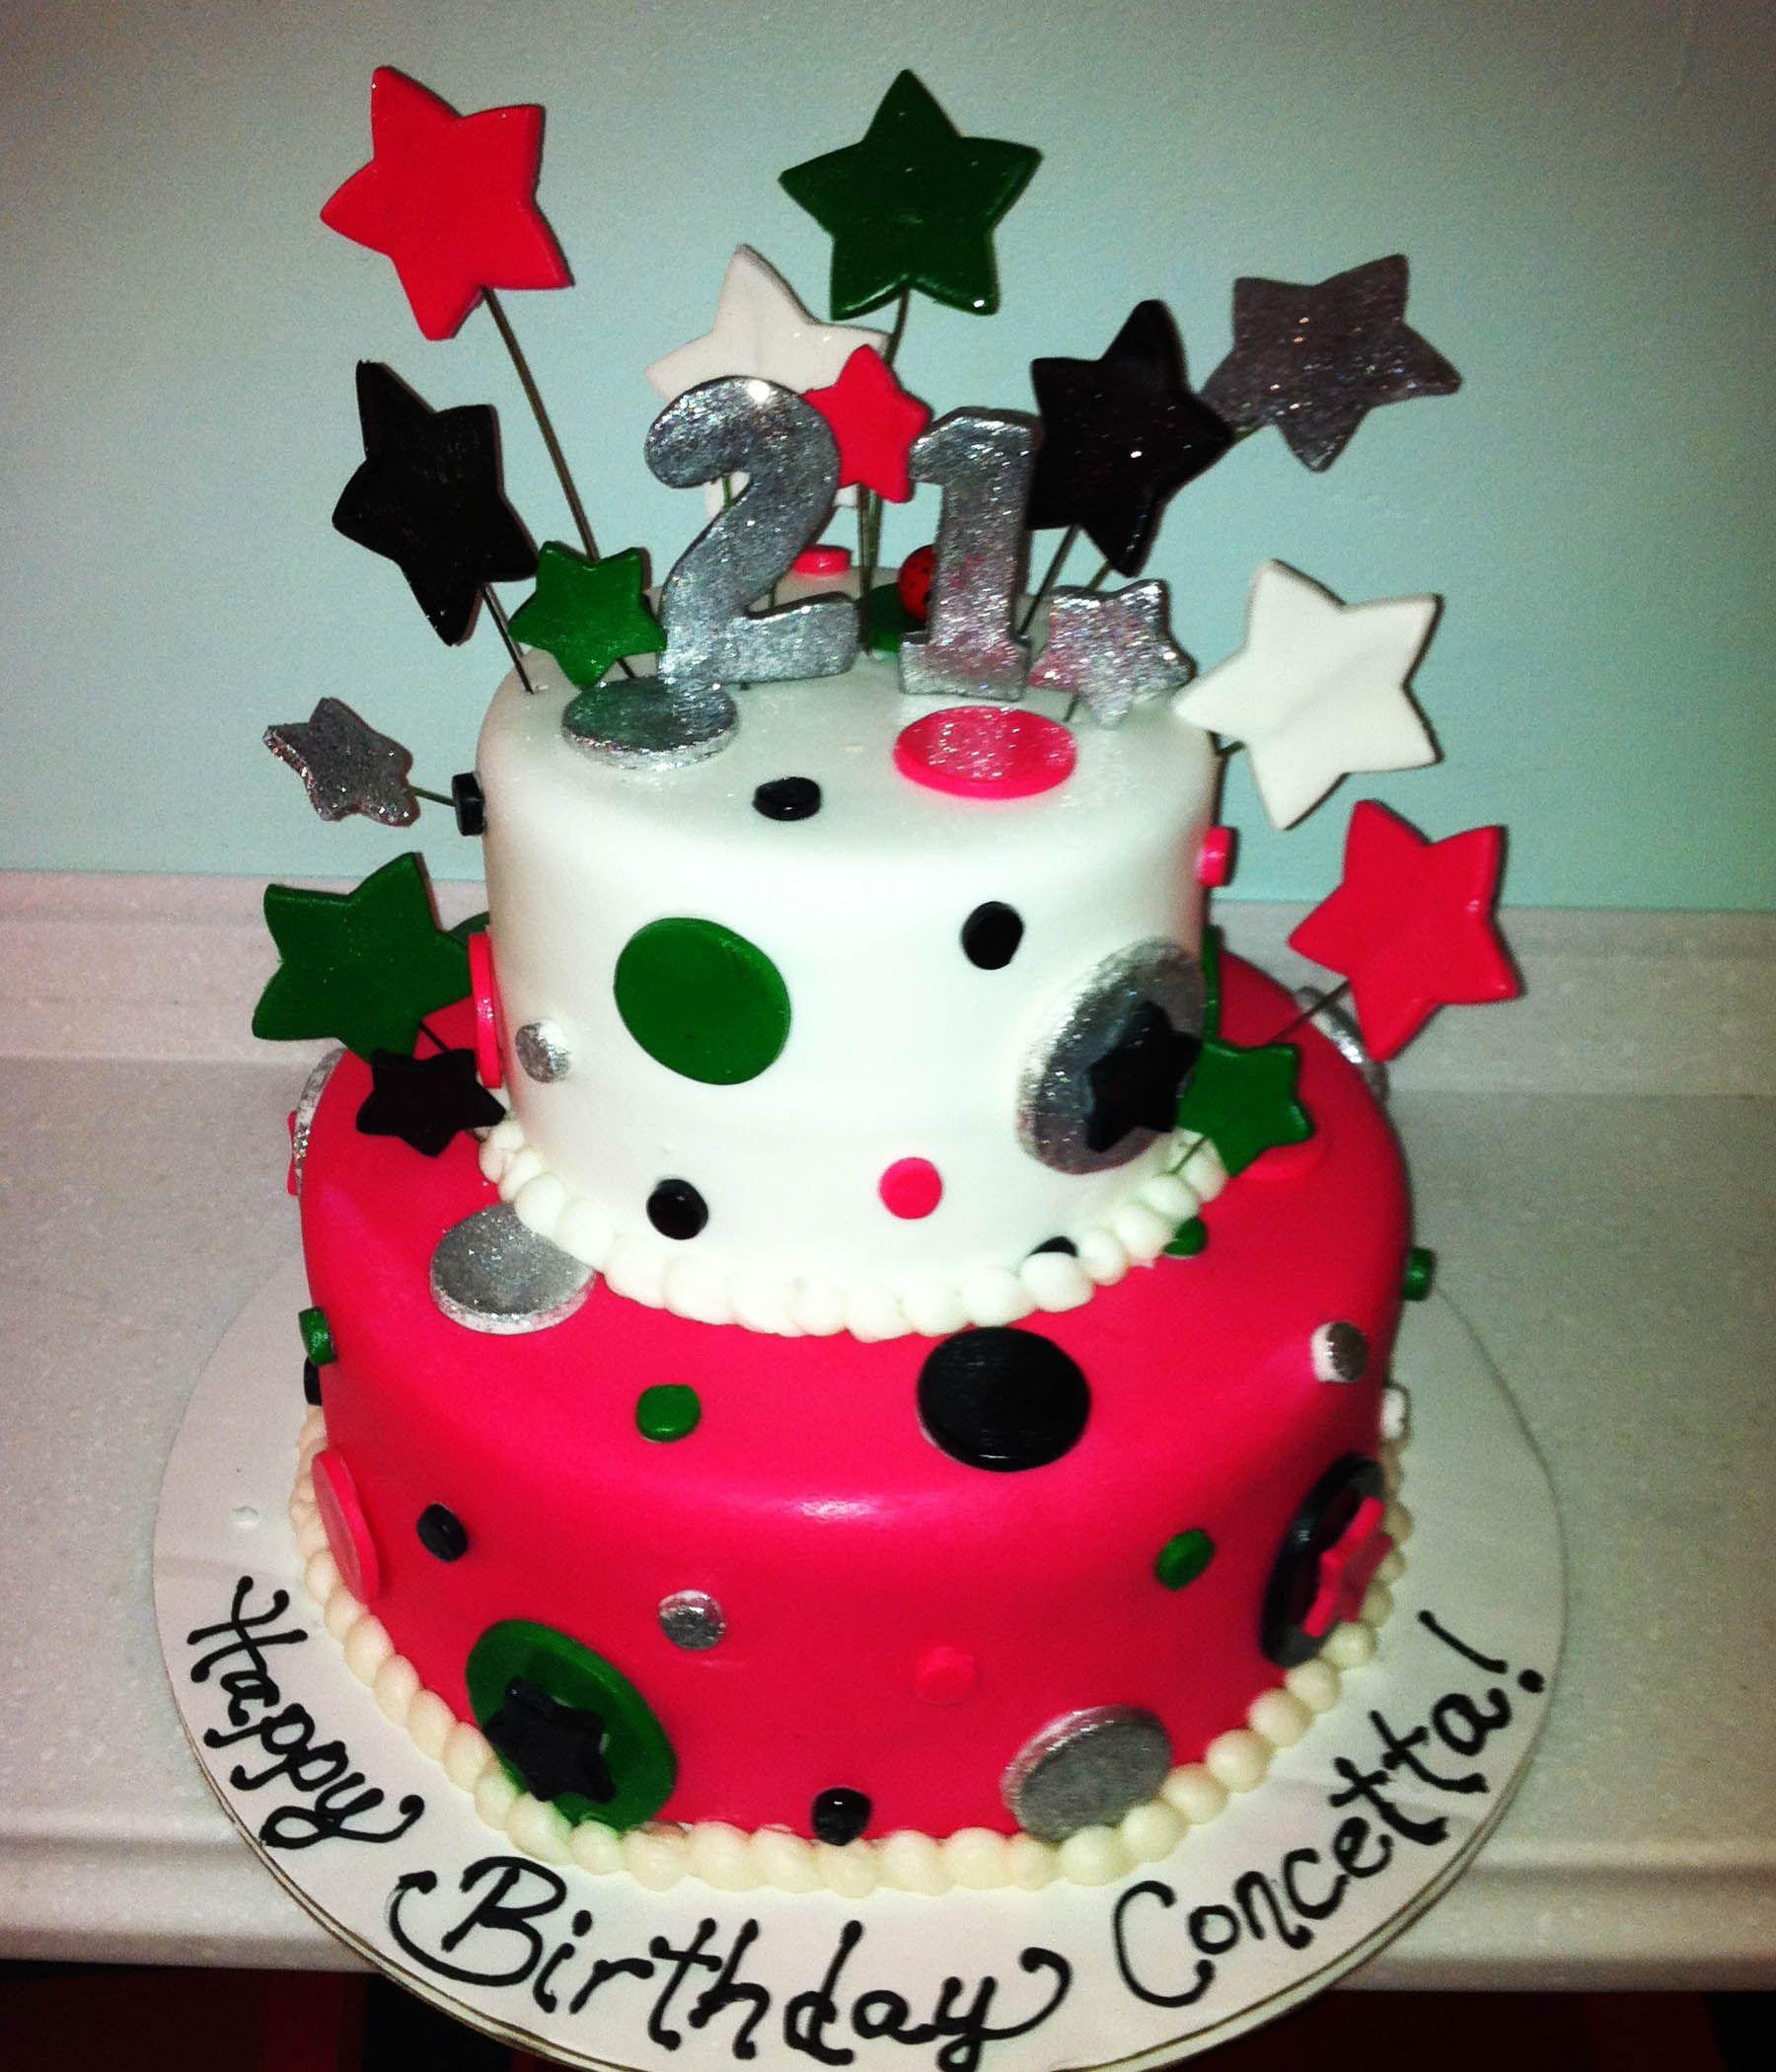 21st Birthday Cakes, 21st Cake, 21st